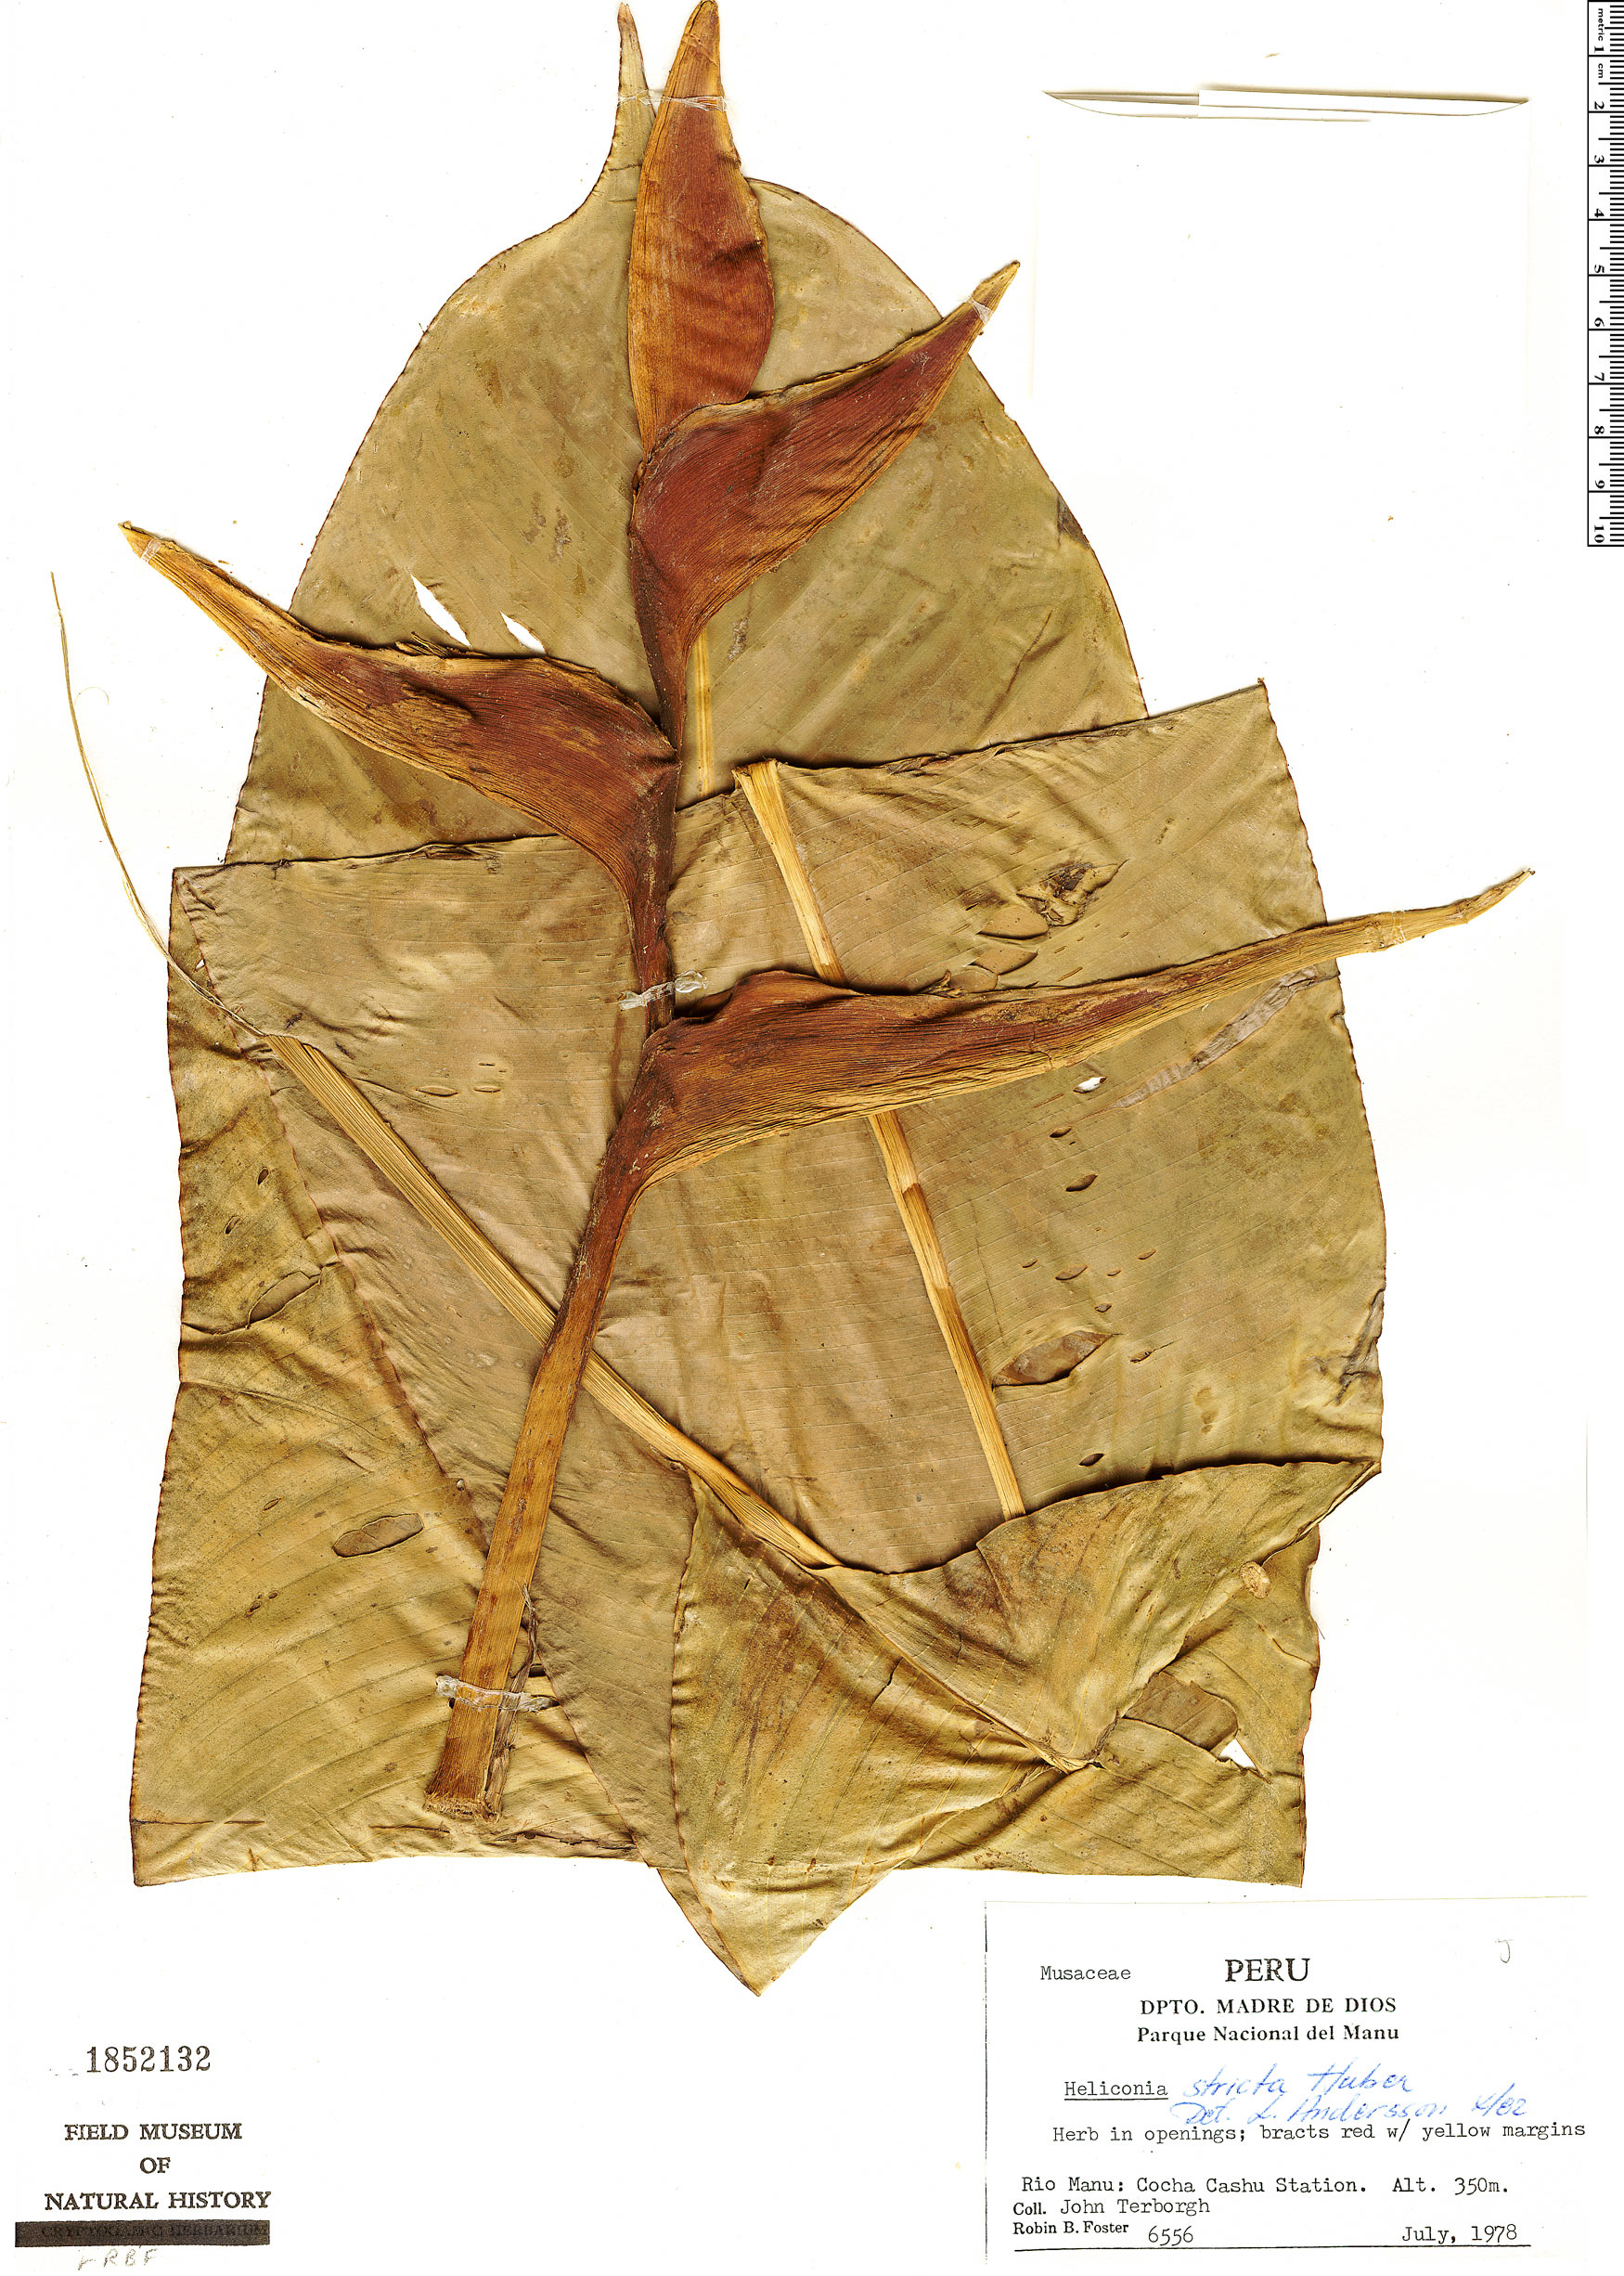 Espécimen: Heliconia stricta